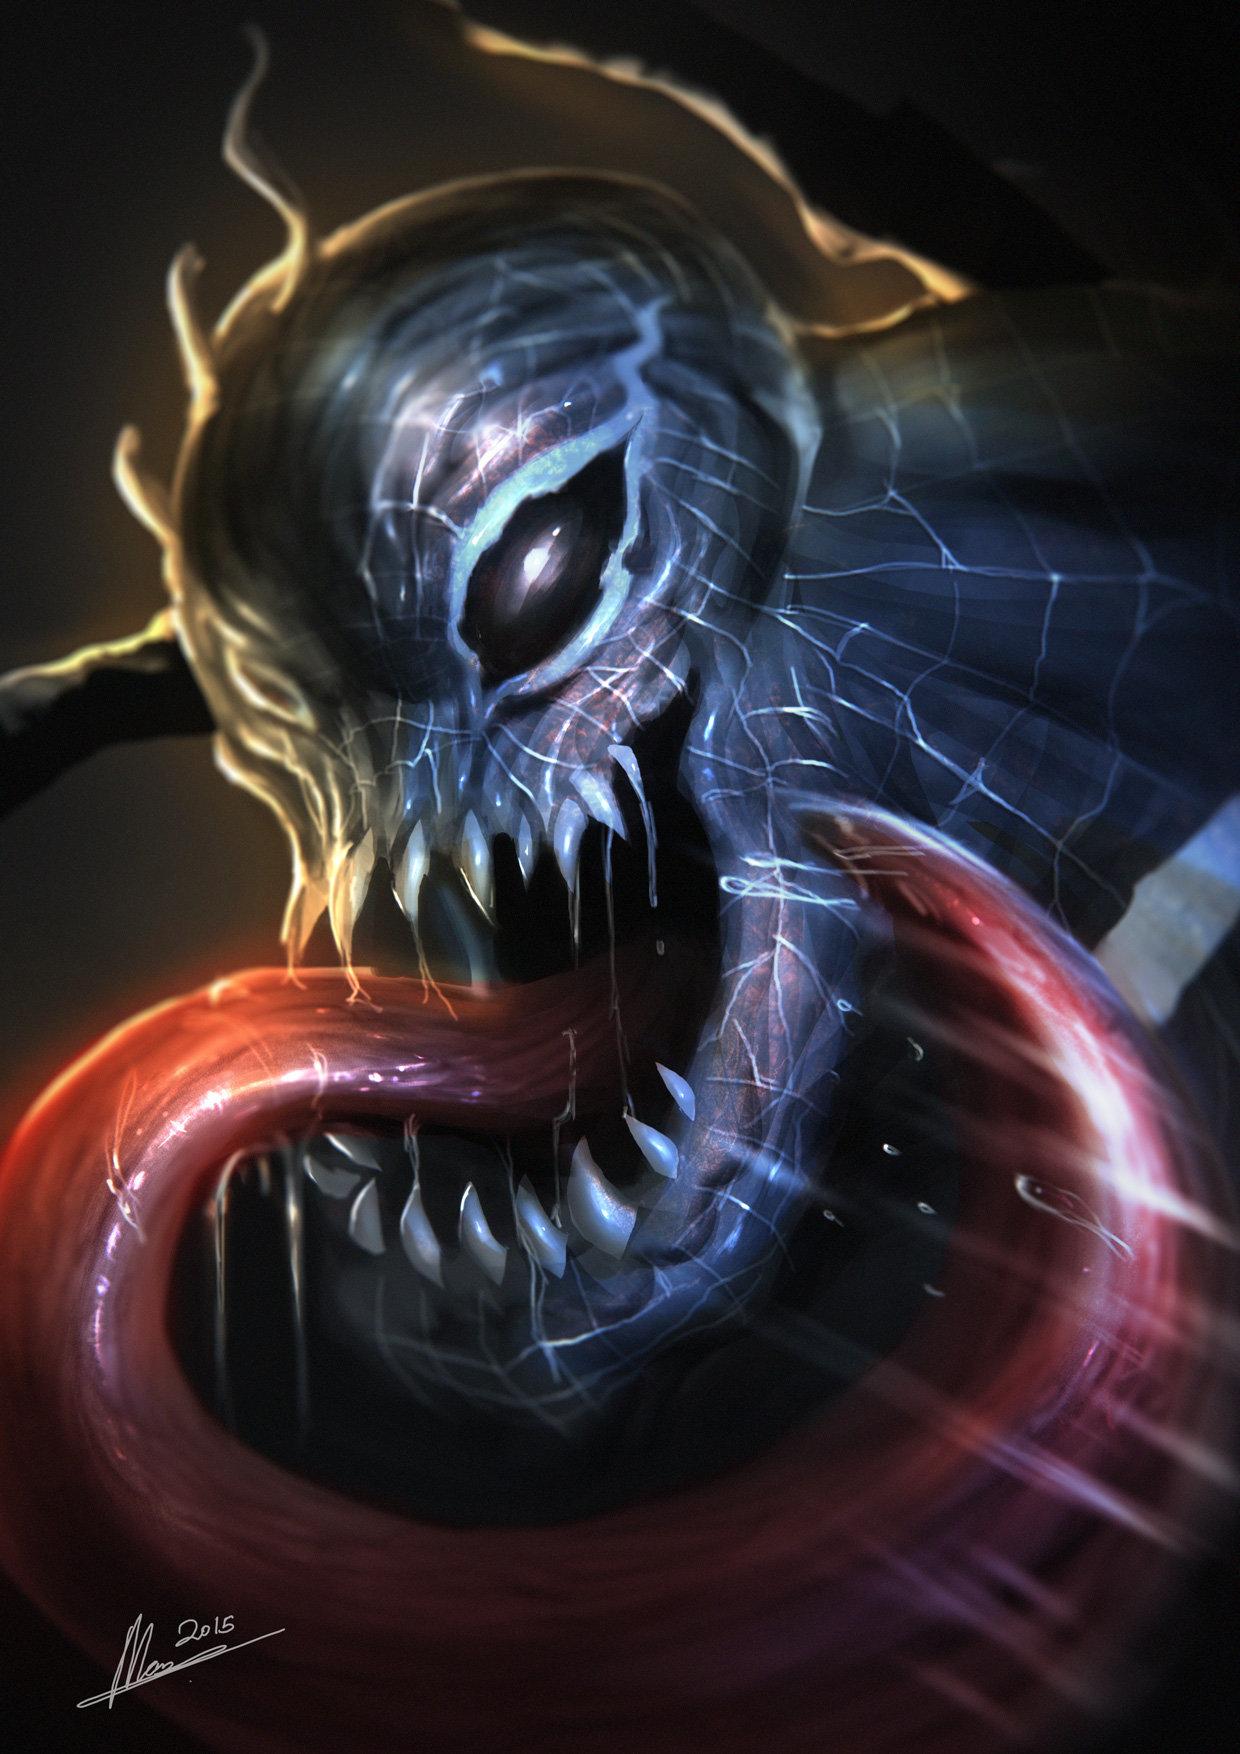 Superior Venom Backgrounds on Wallpapers Vista